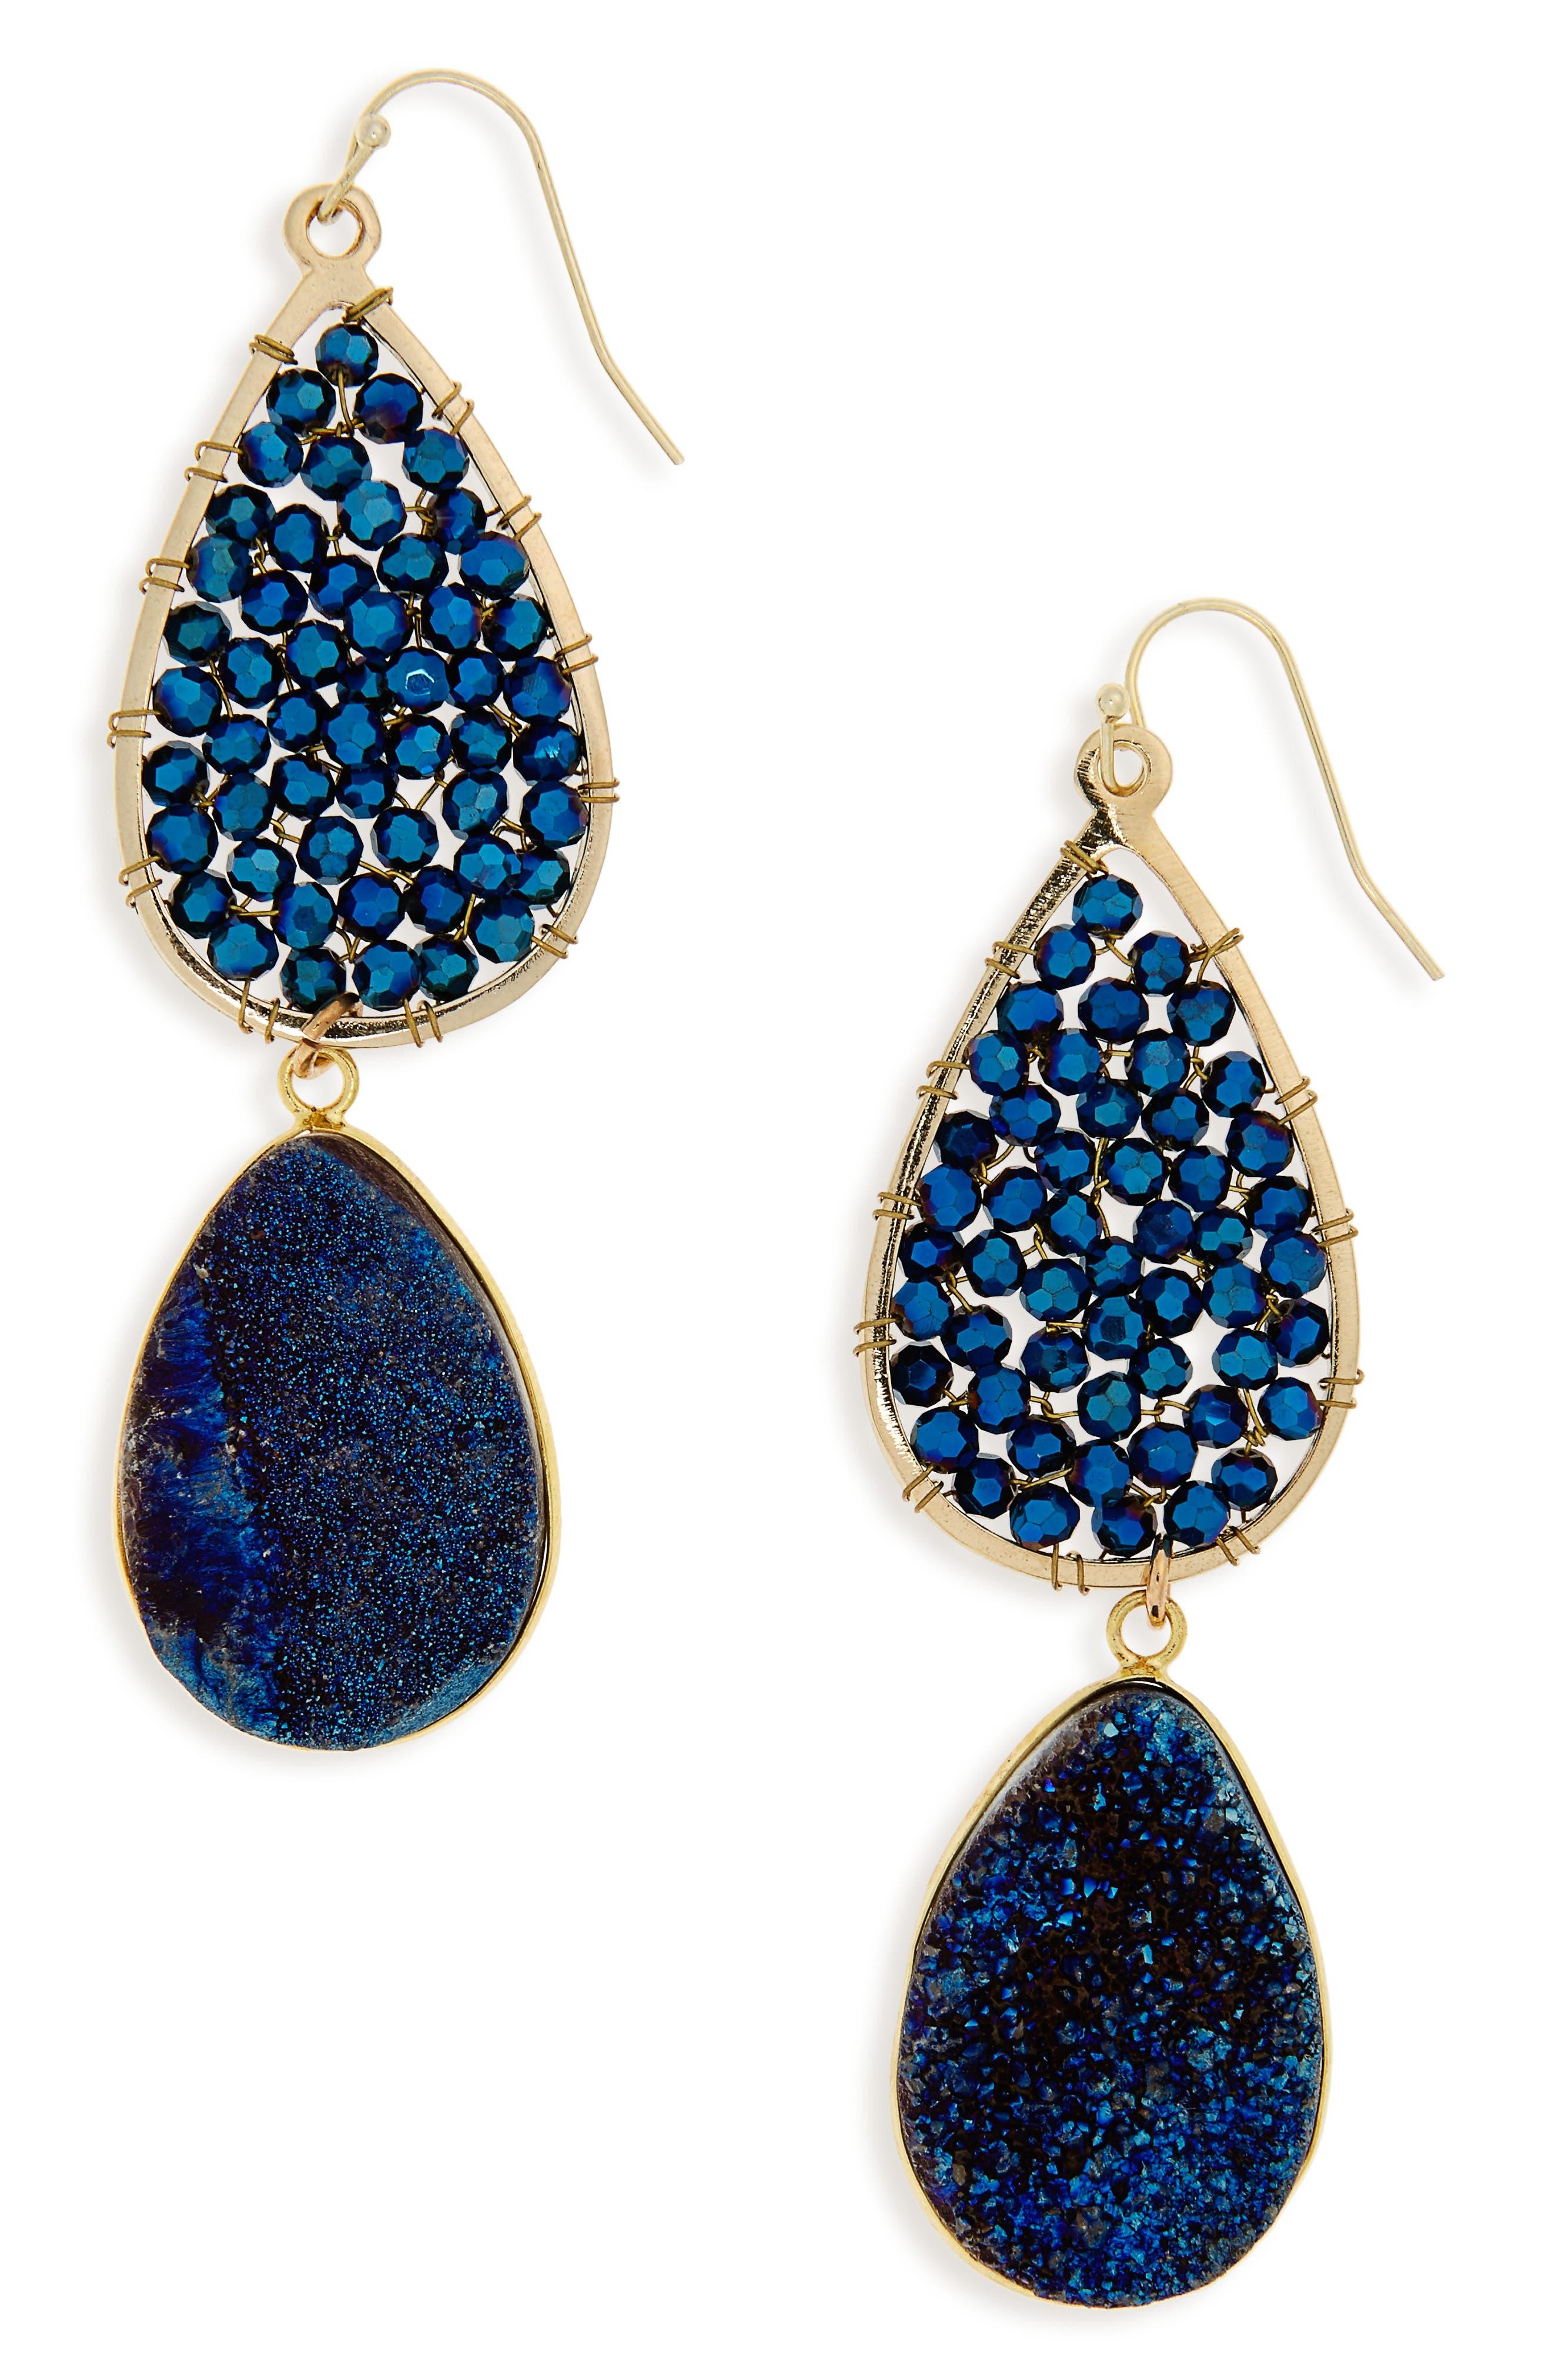 Crystal Drop Earrings,                             Main thumbnail 1, color,                             410